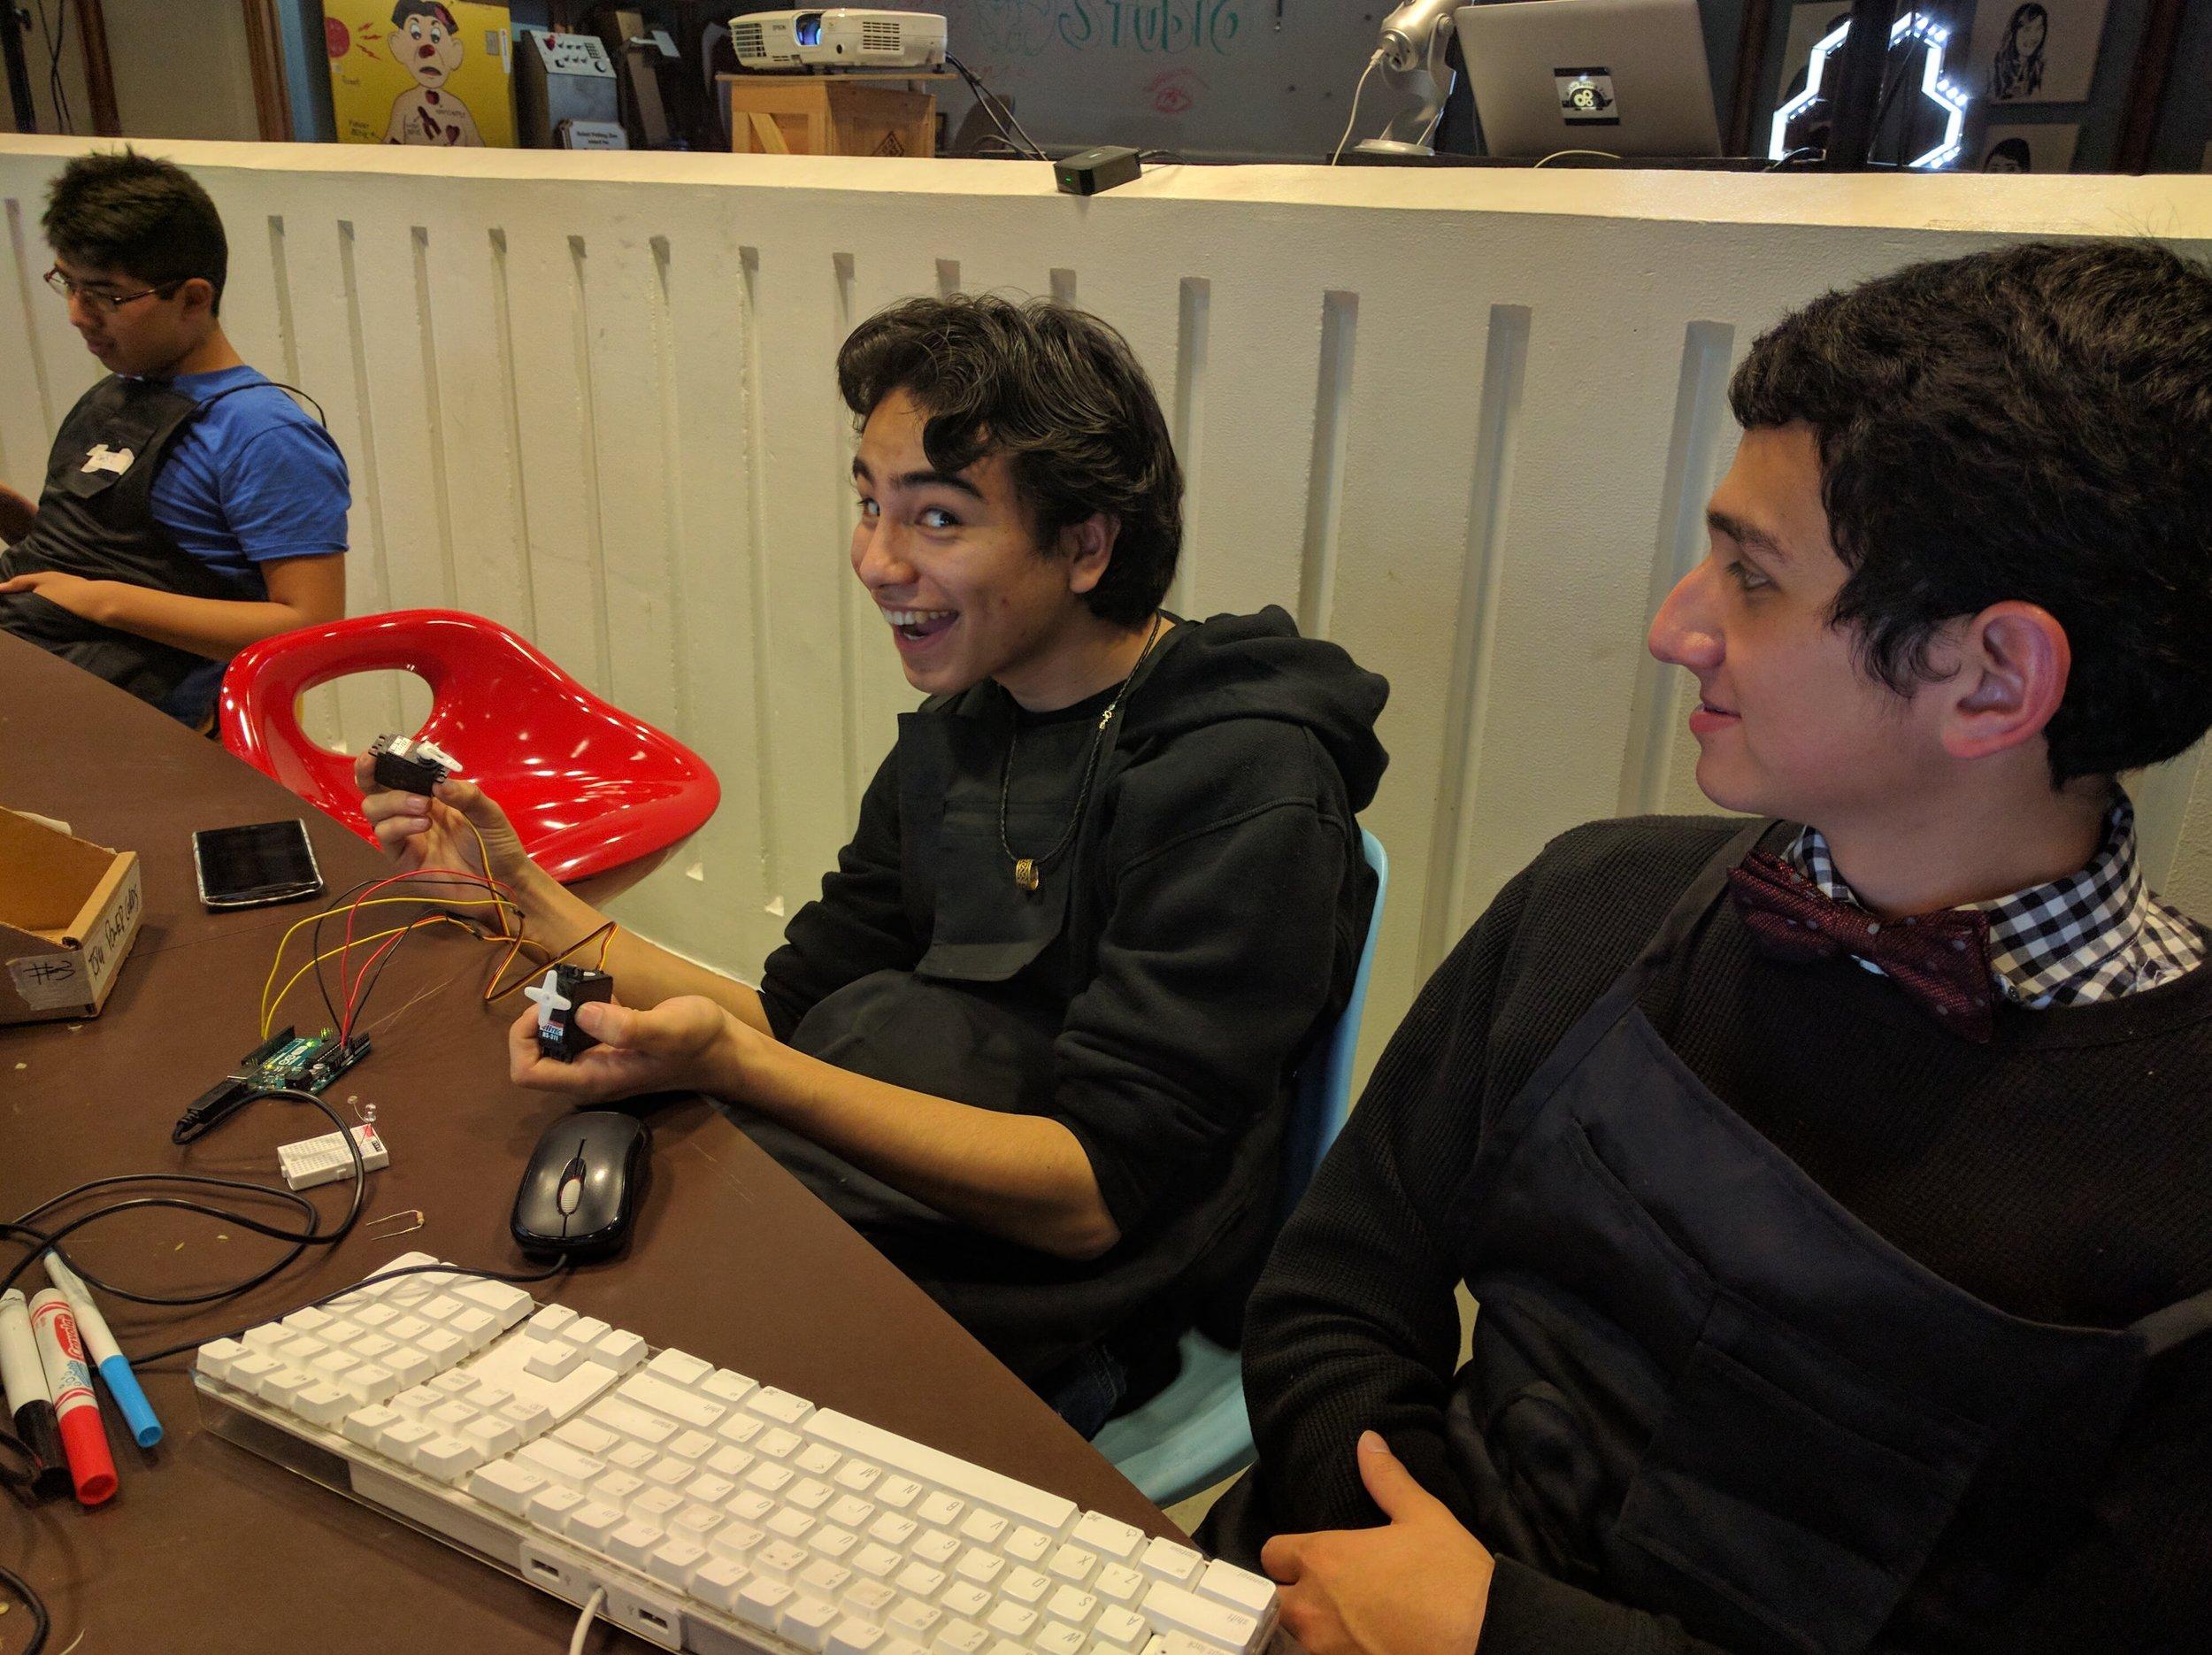 DJ and Javier troubleshooting their servos.